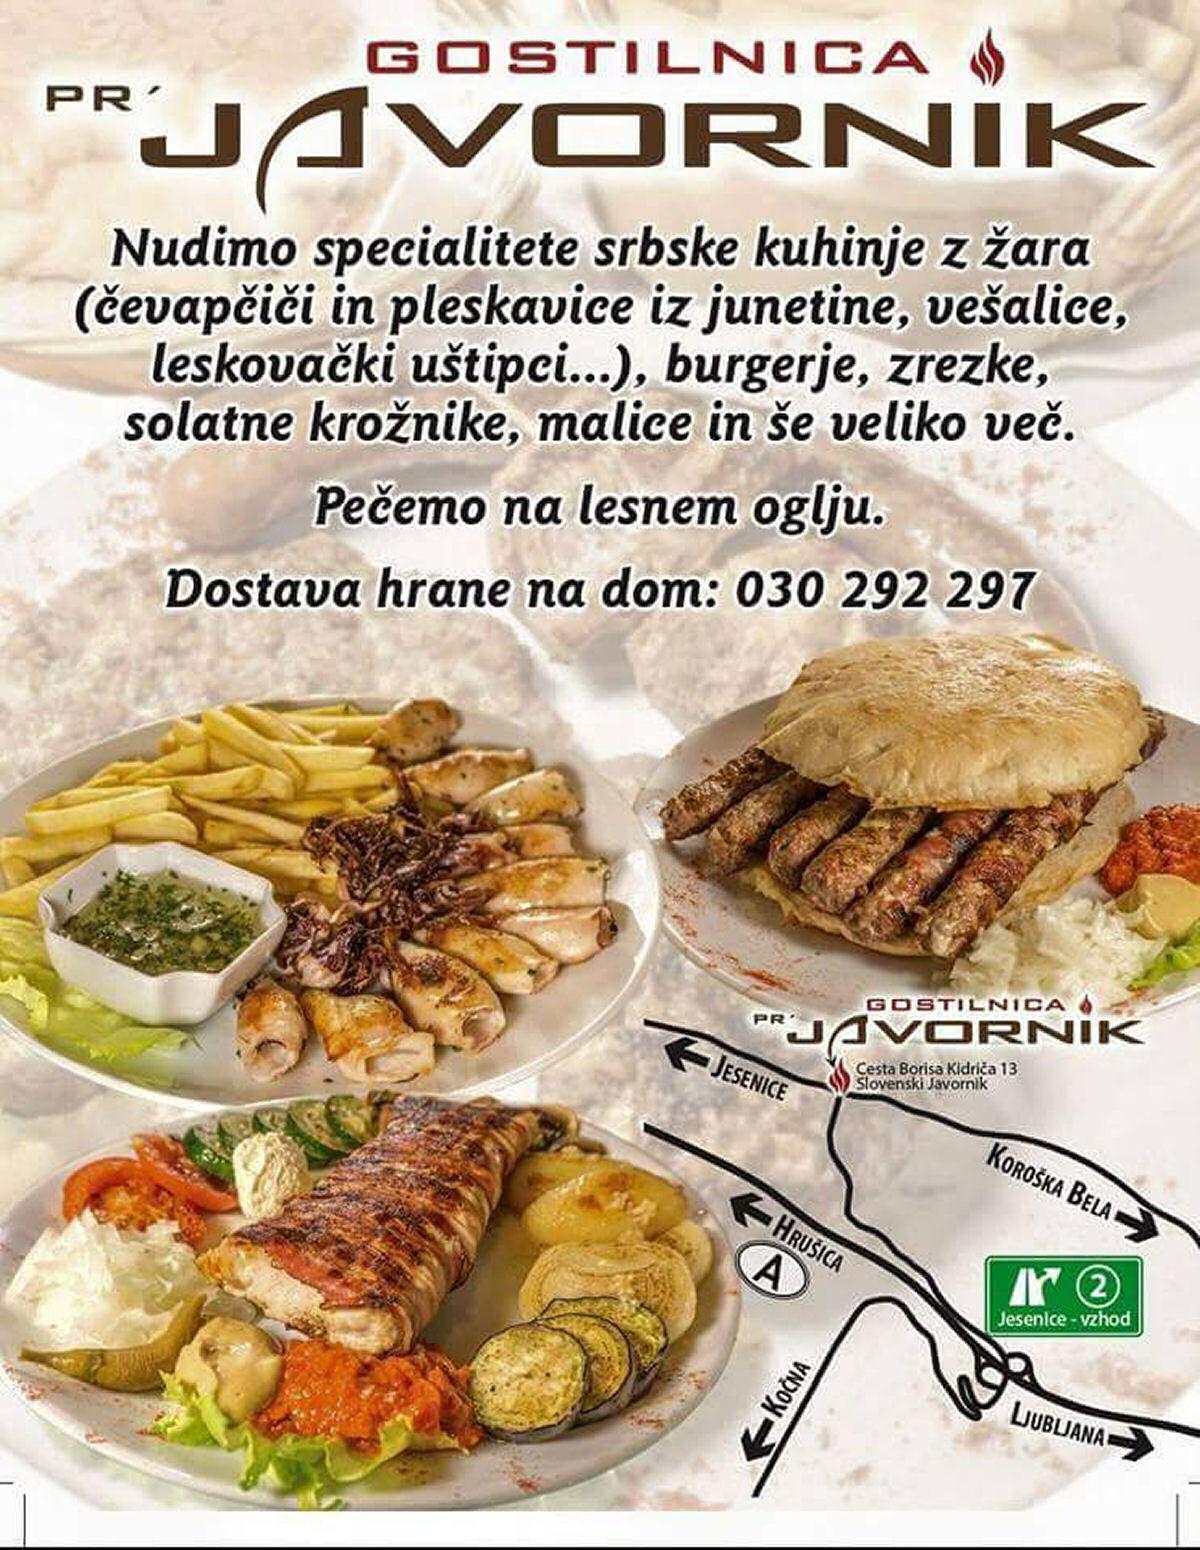 restaurant-pr-javornik-89